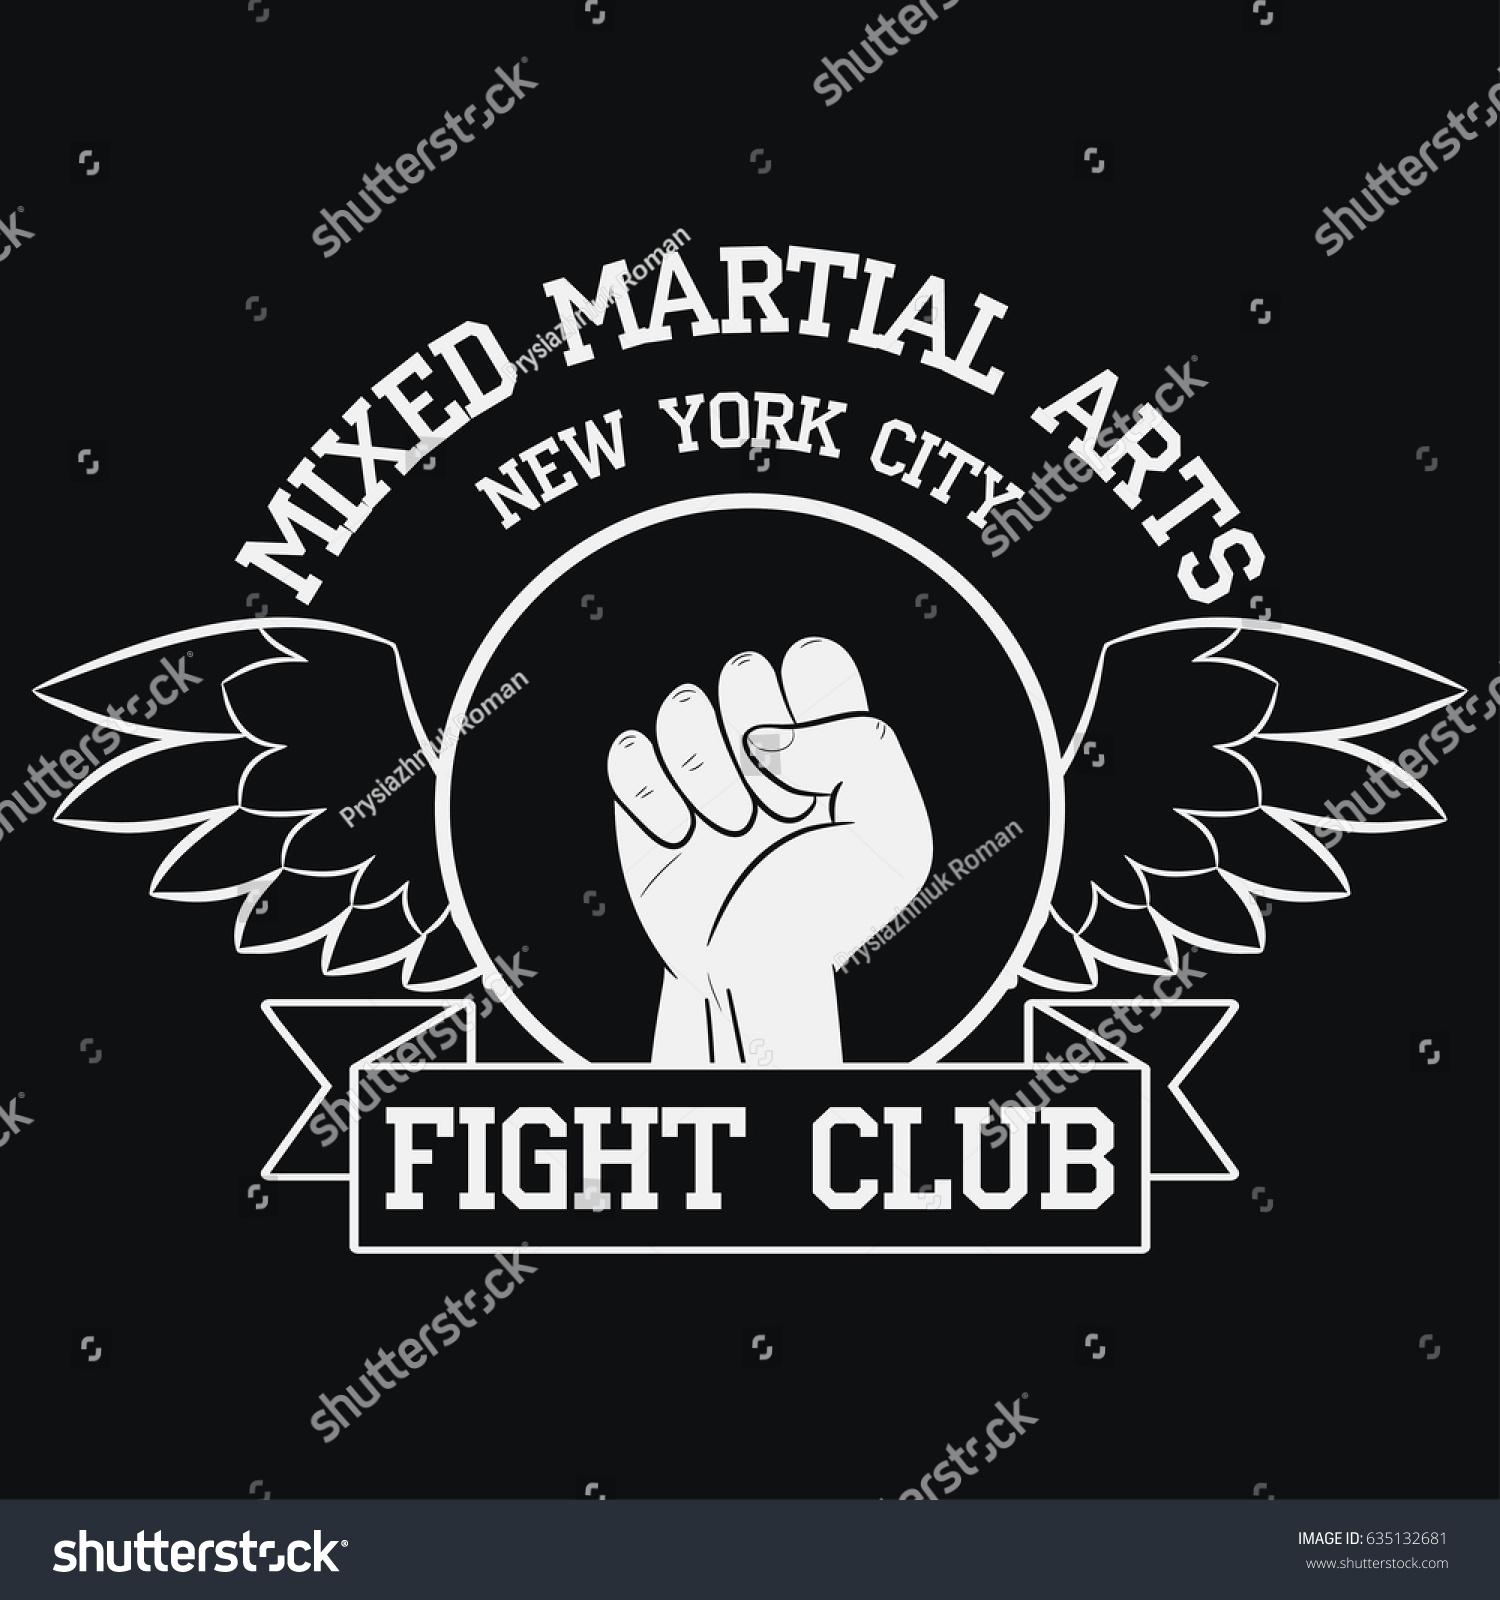 Fight Club Logo New York MMA Stock-Vektorgrafik 635132681 – Shutterstock